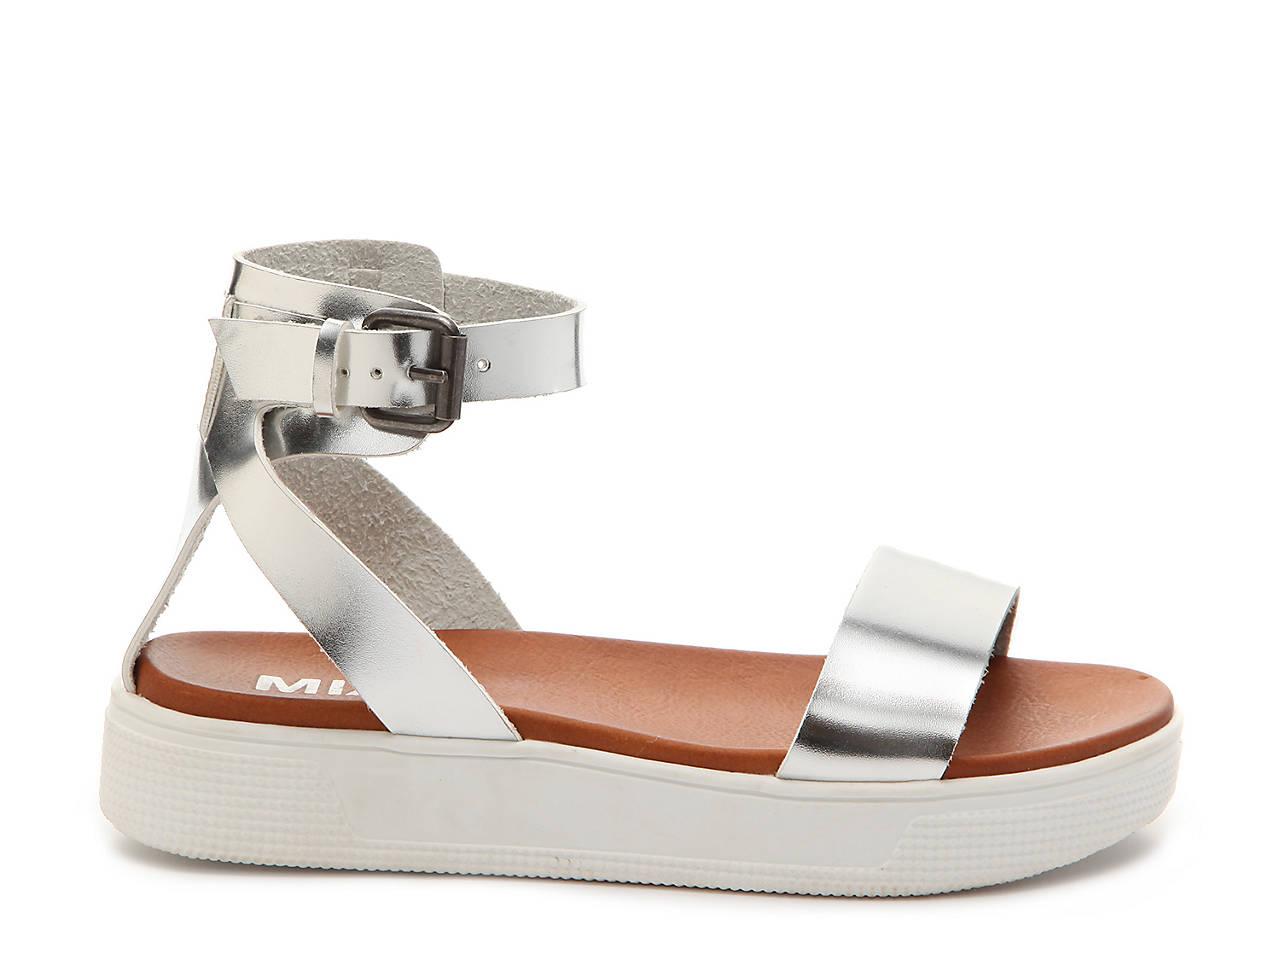 c77ecd501bdd Mia Ellen Platform Sandal Women s Shoes